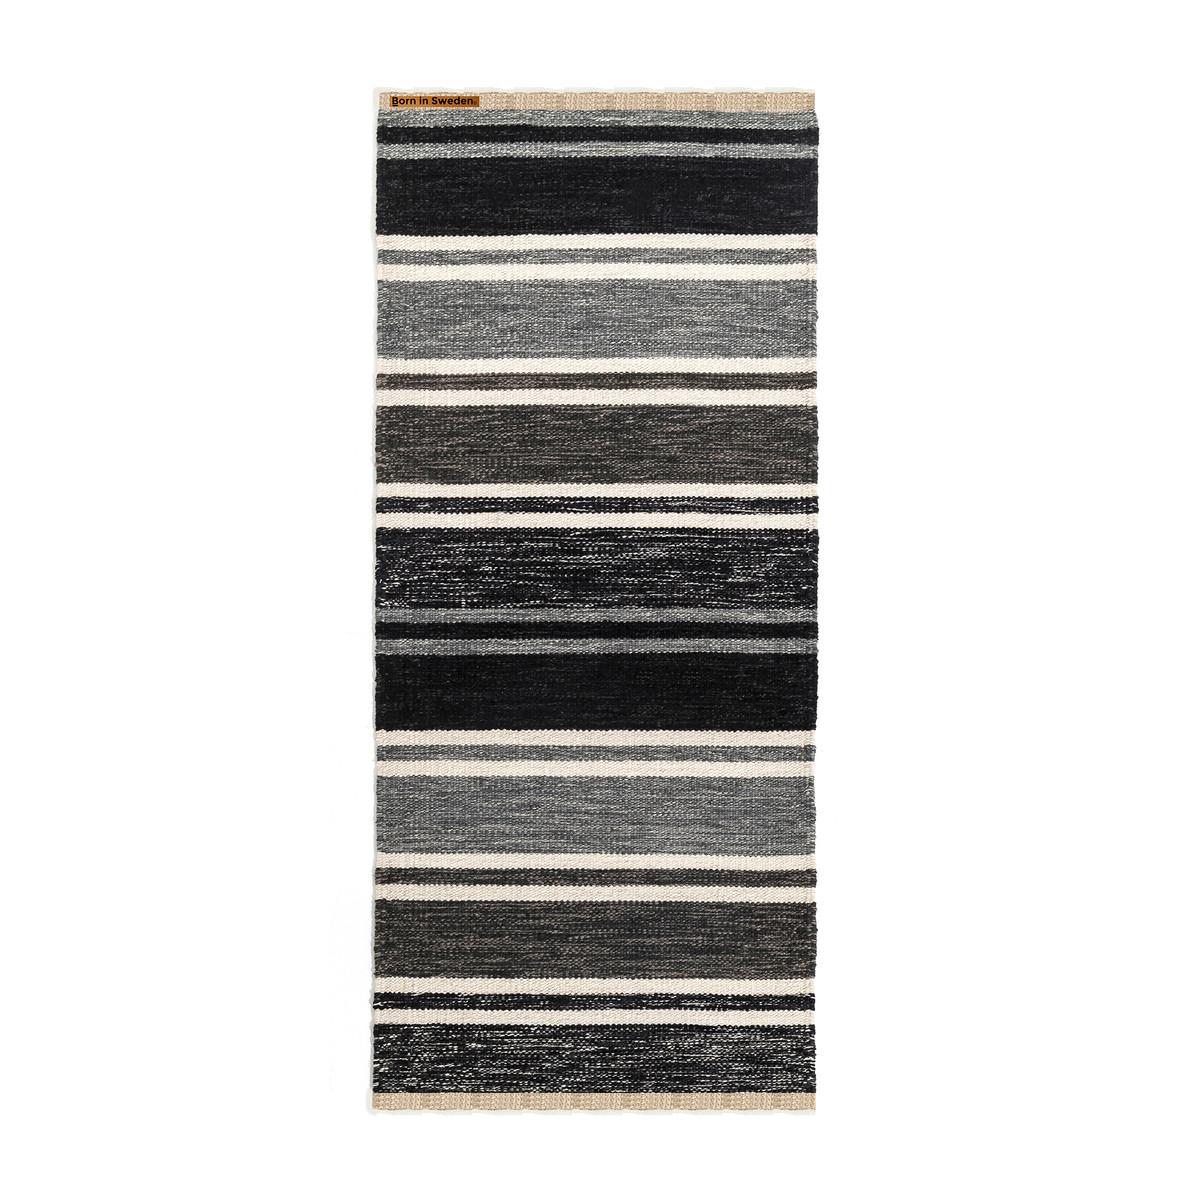 born in sweden teppich tom 80 x 160 cm dunkelgrau hellgrau wei schwarz grau t 75 h. Black Bedroom Furniture Sets. Home Design Ideas